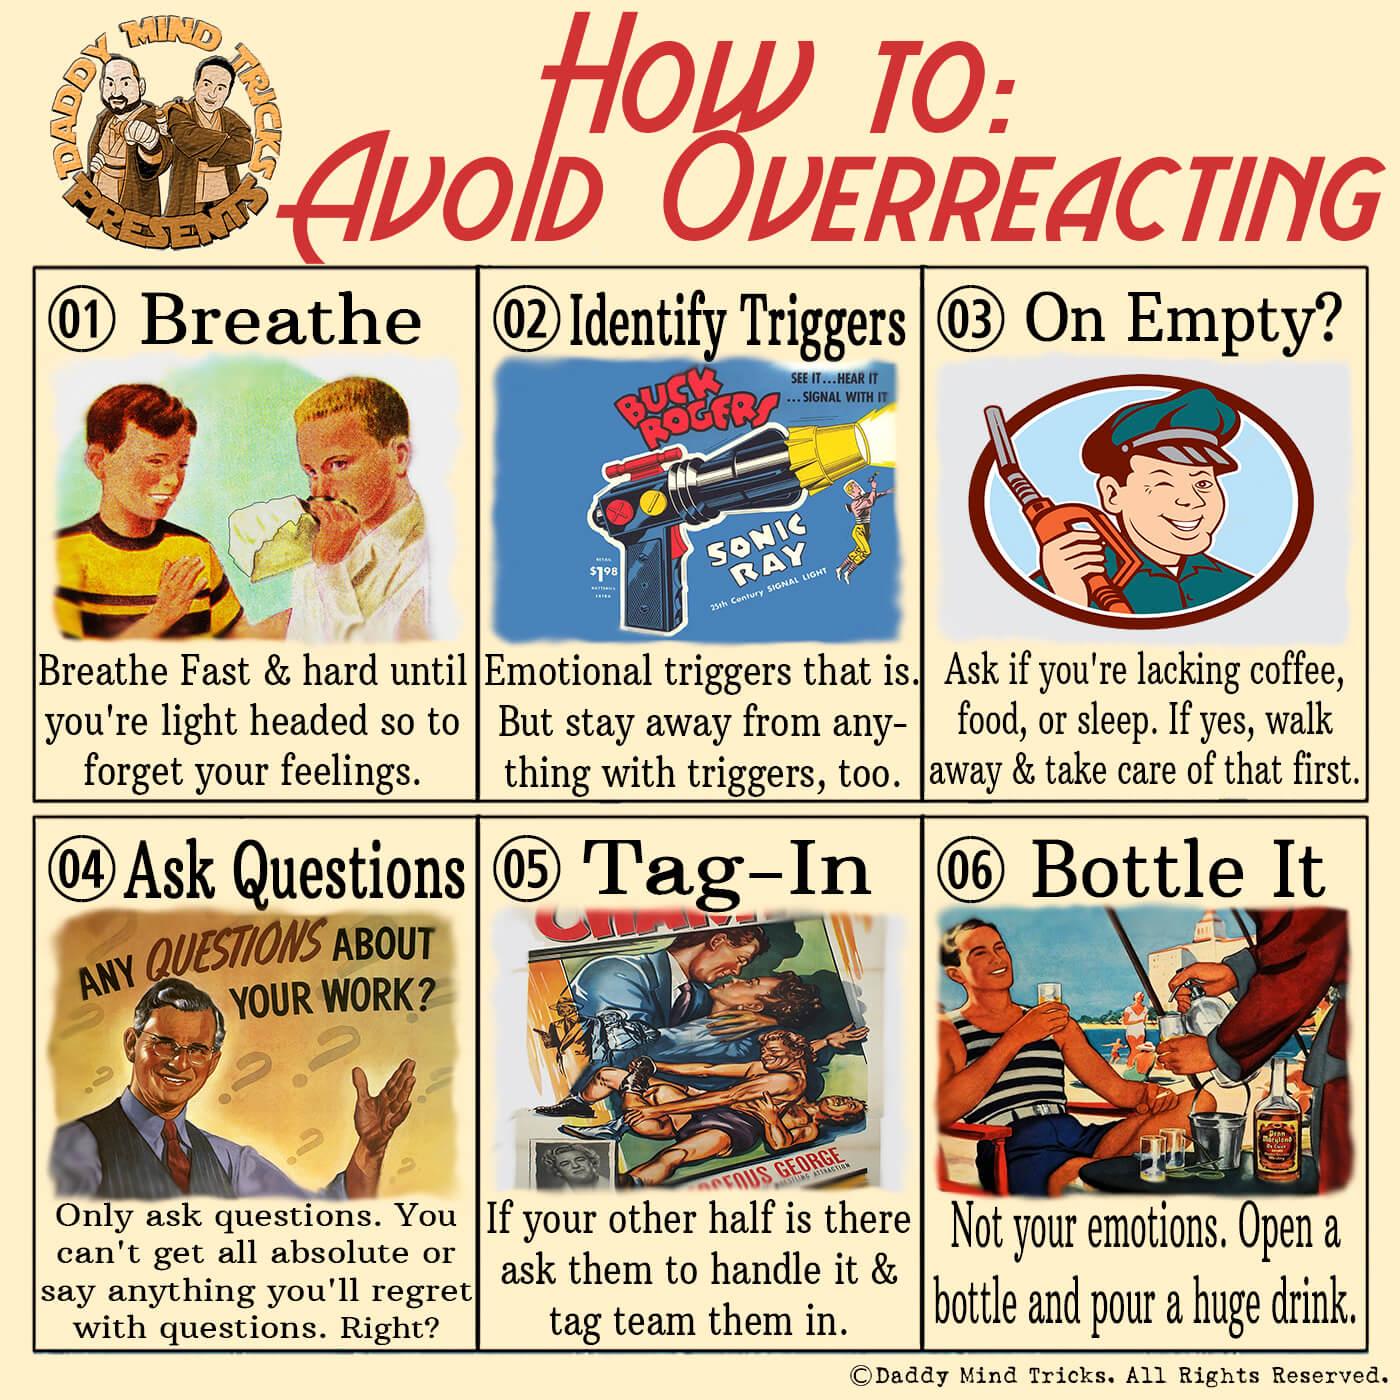 how to avoid overreacting